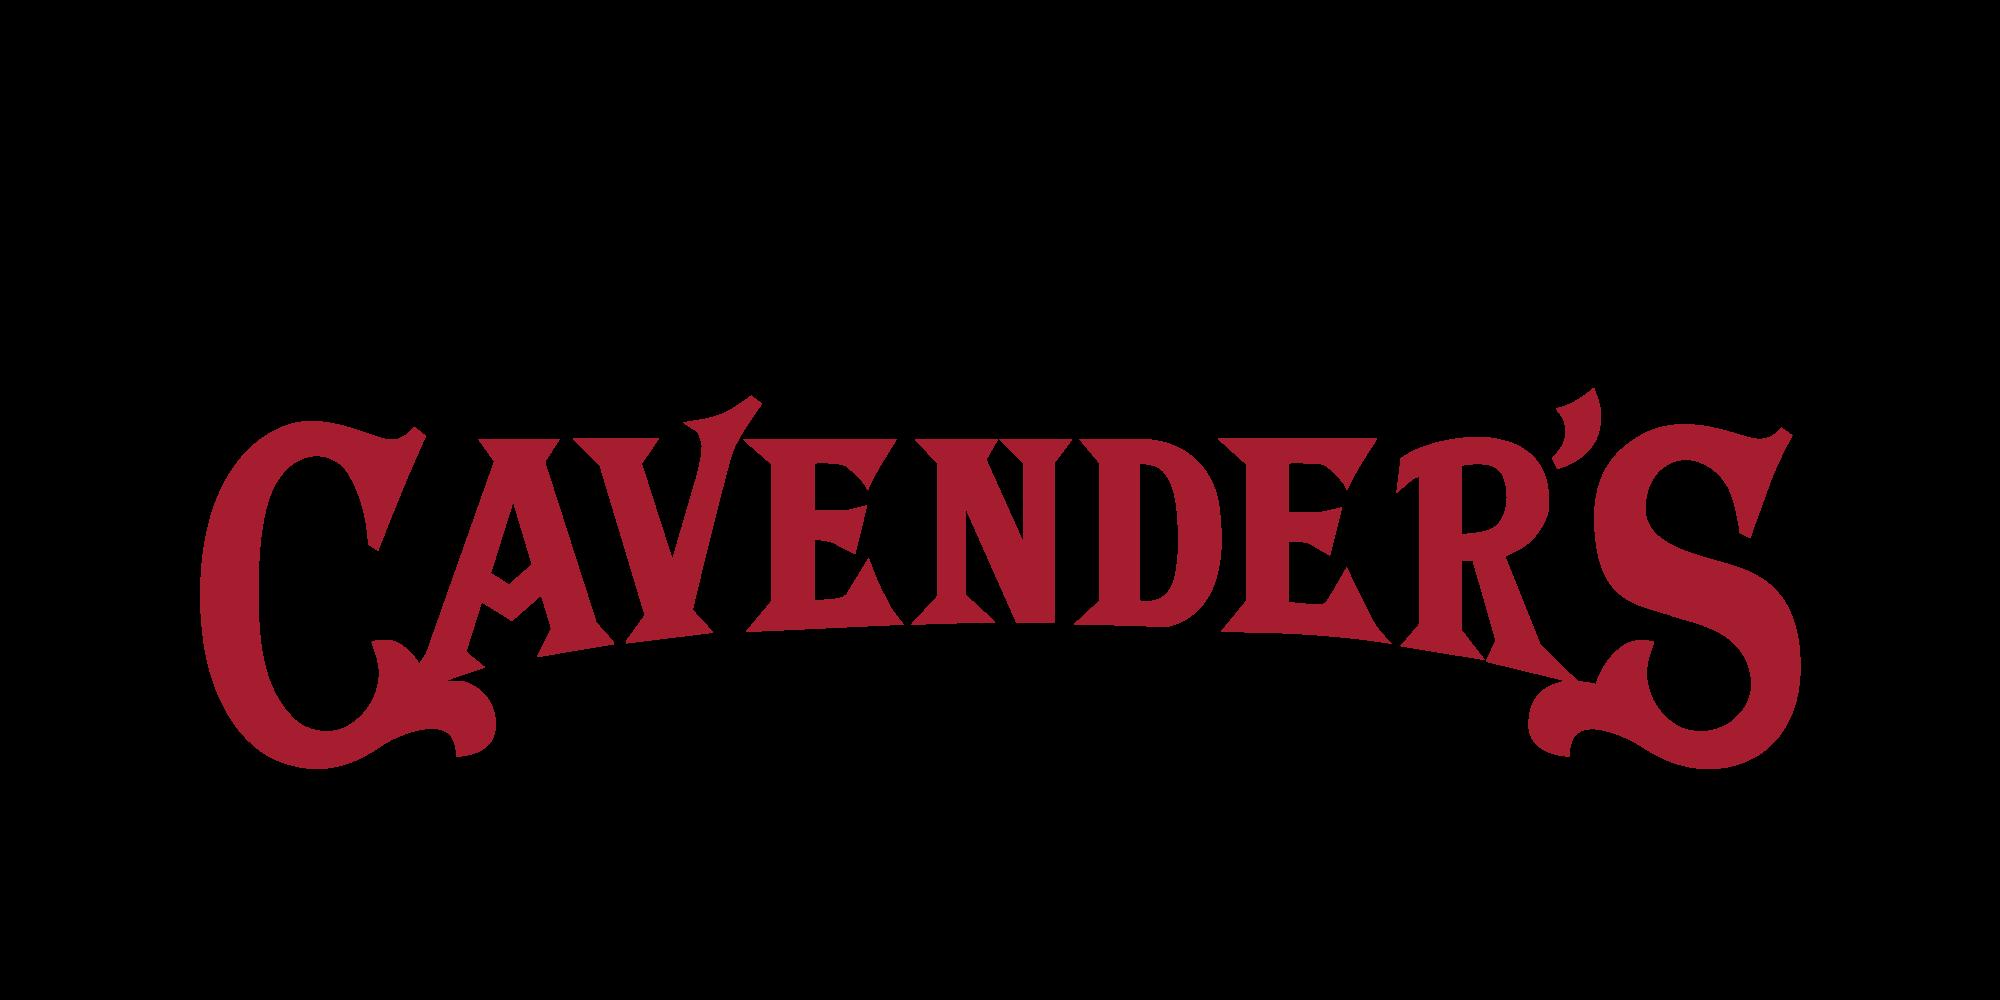 Team Cavender's